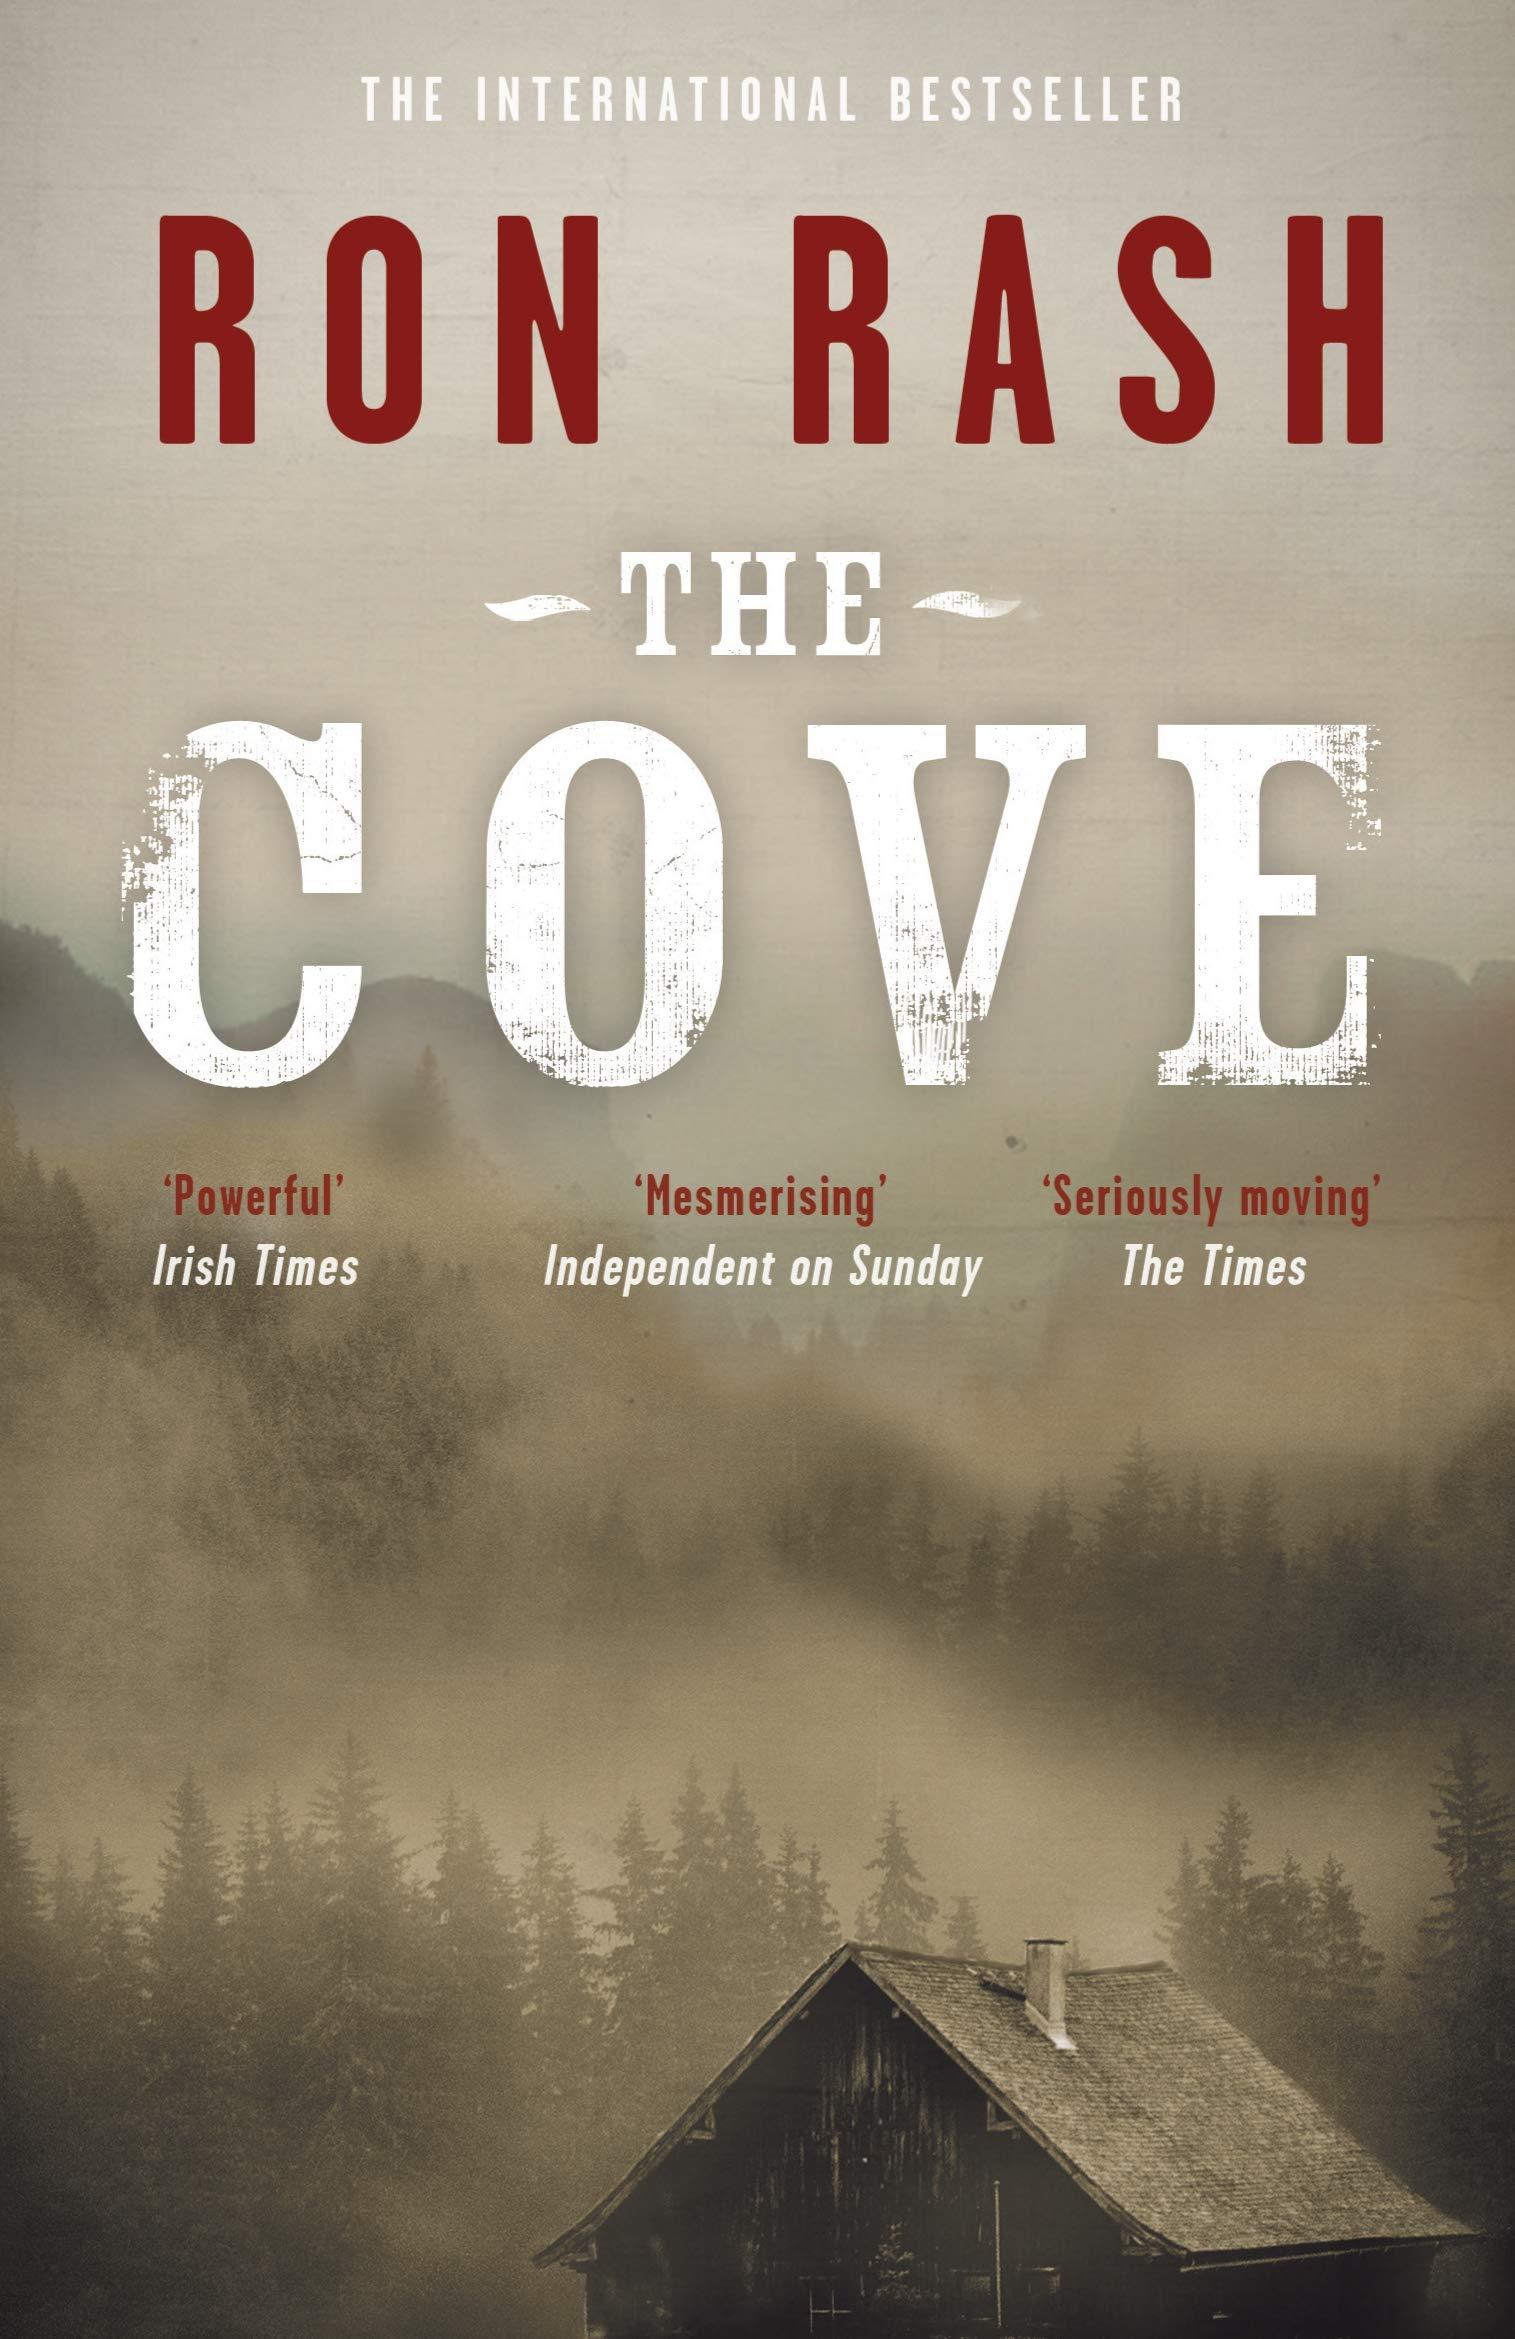 The Cove: Amazon.es: Rash, Ron: Libros en idiomas extranjeros